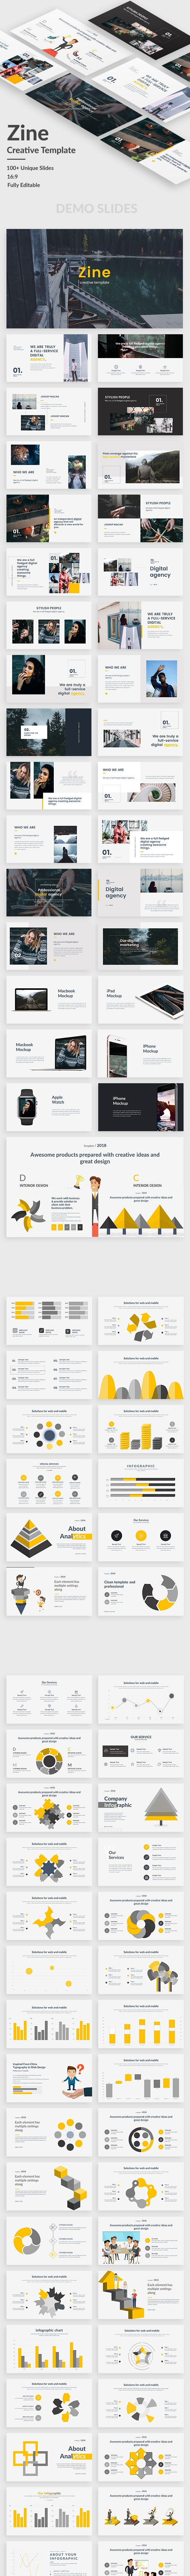 Zine Creative Google Slide Template - Google Slides Presentation Templates